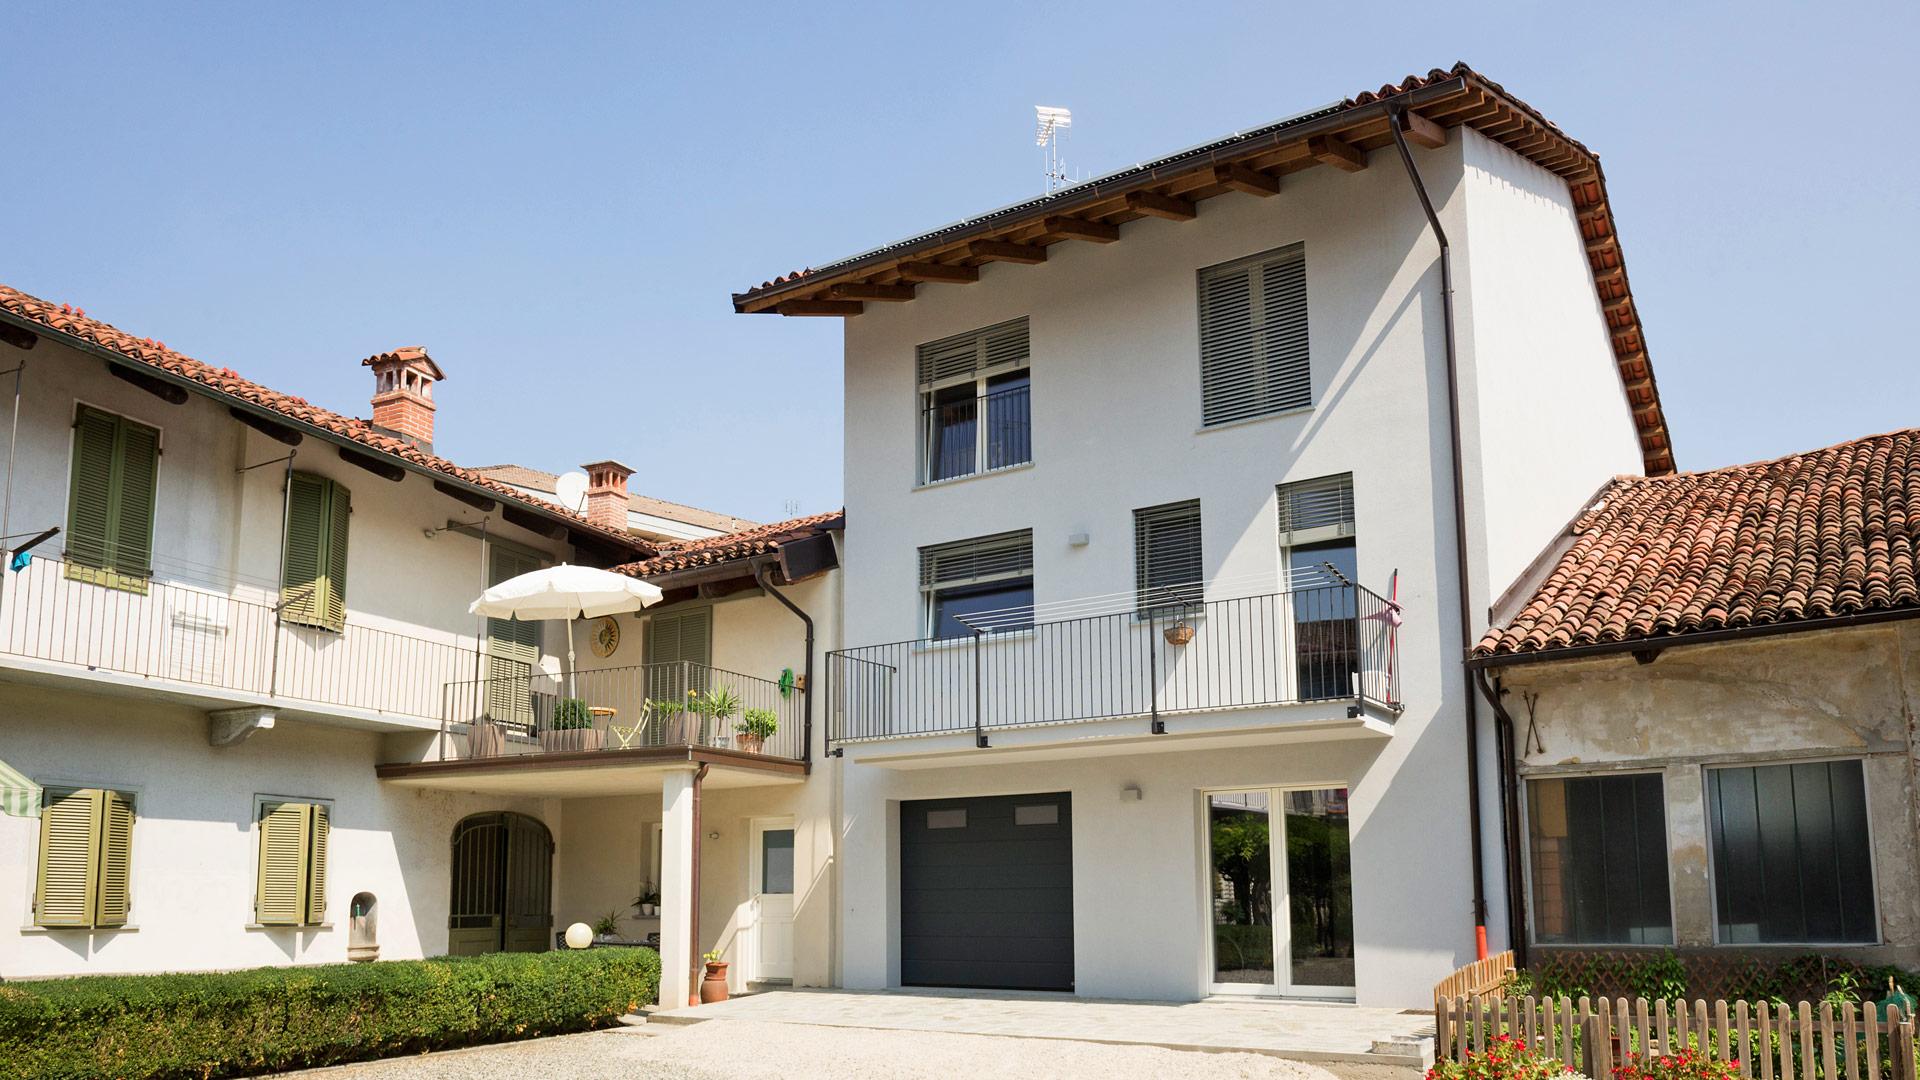 Ristrutturazione casa in legno xlam certificata casaclima for Incentivi ristrutturazione casa 2017